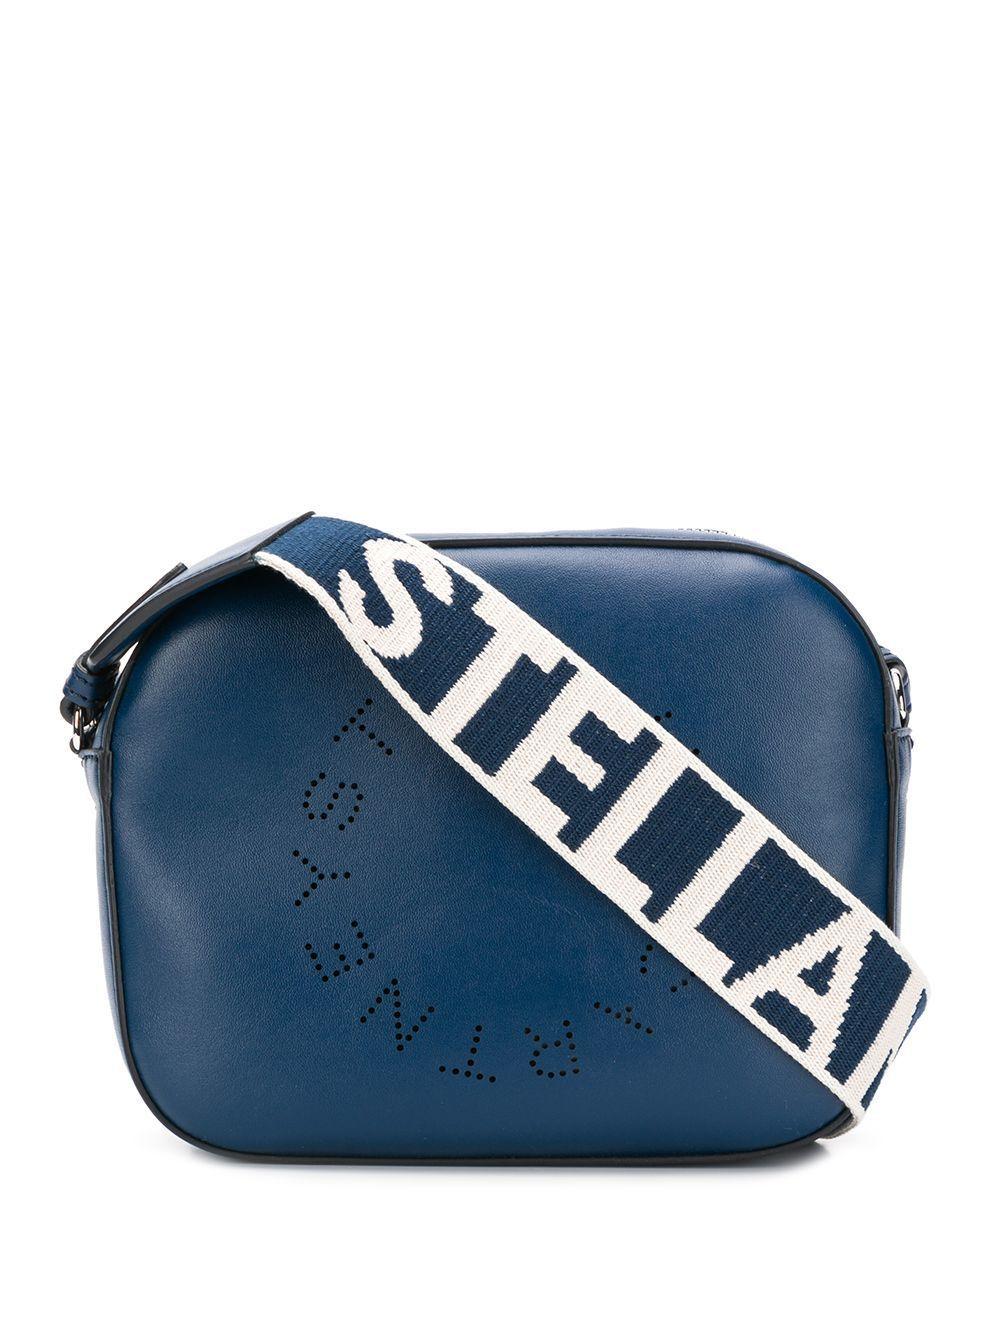 Stella McCartney相機包,售價648美元、約合台幣約19,929元...